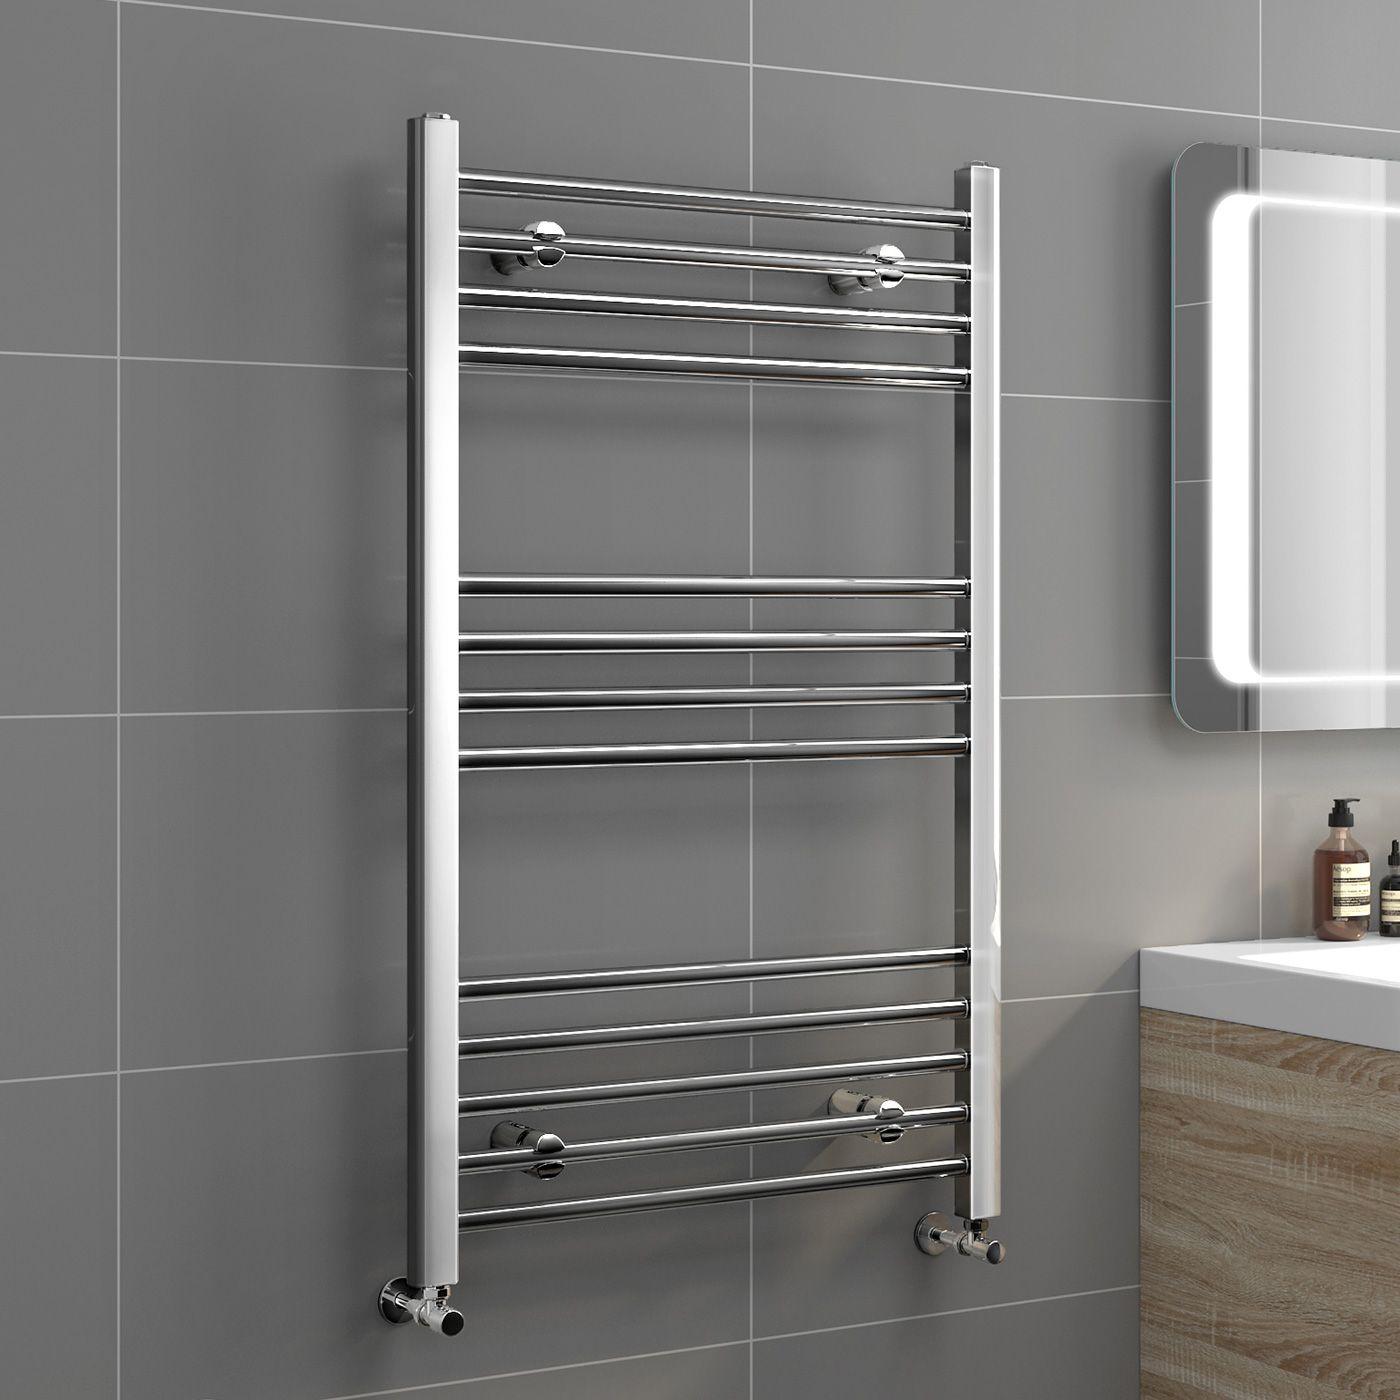 1000x600mm 20mm tubes chrome heated straight rail ladder towel radiator natasha basic